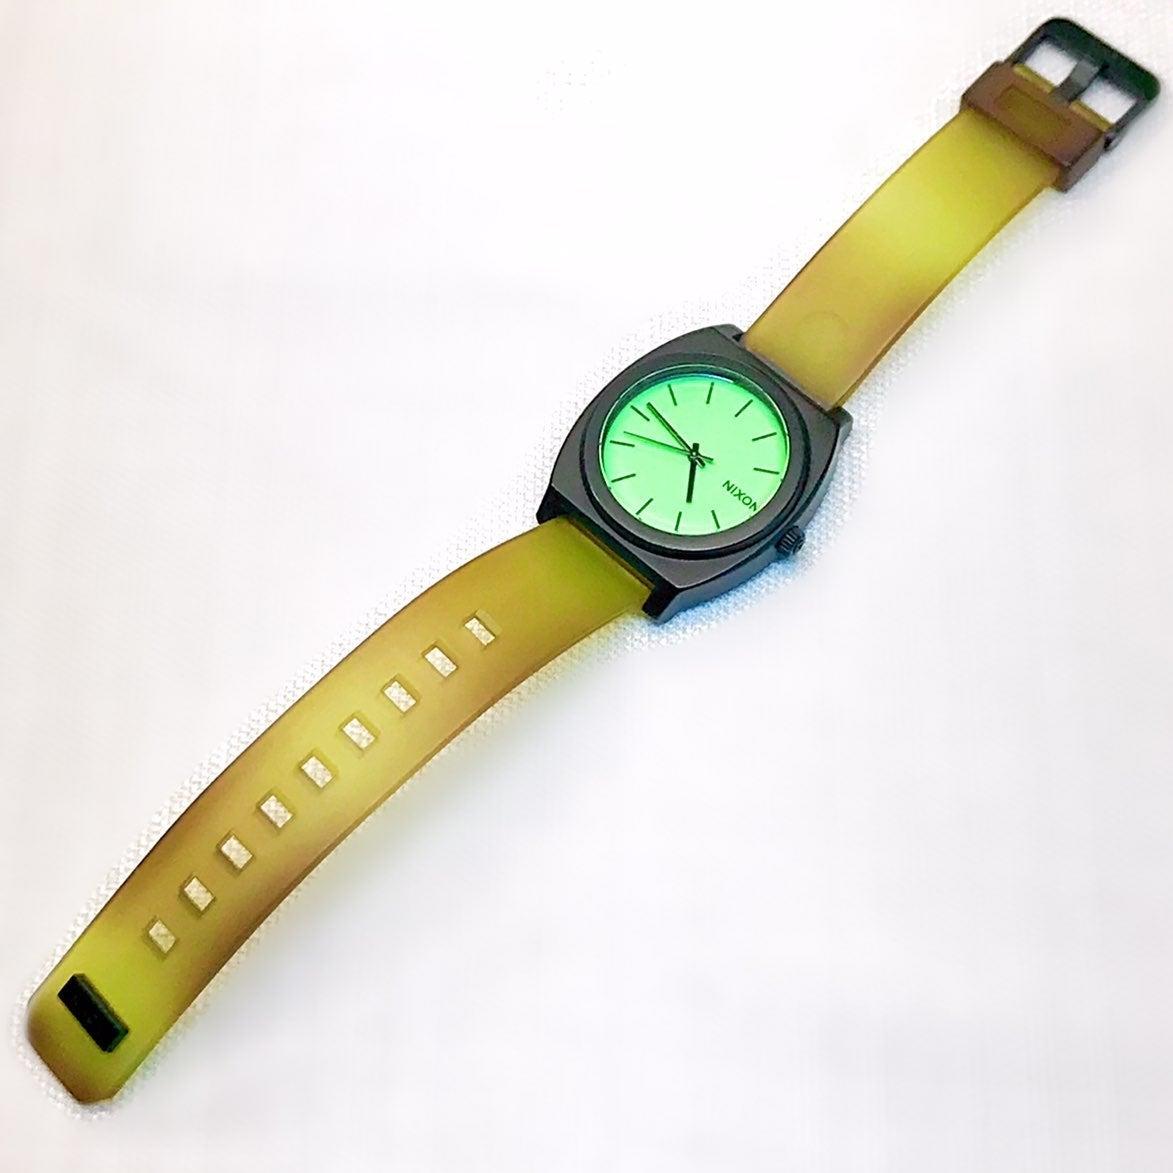 Nixon Time Teller glow-in-the-dark Watch